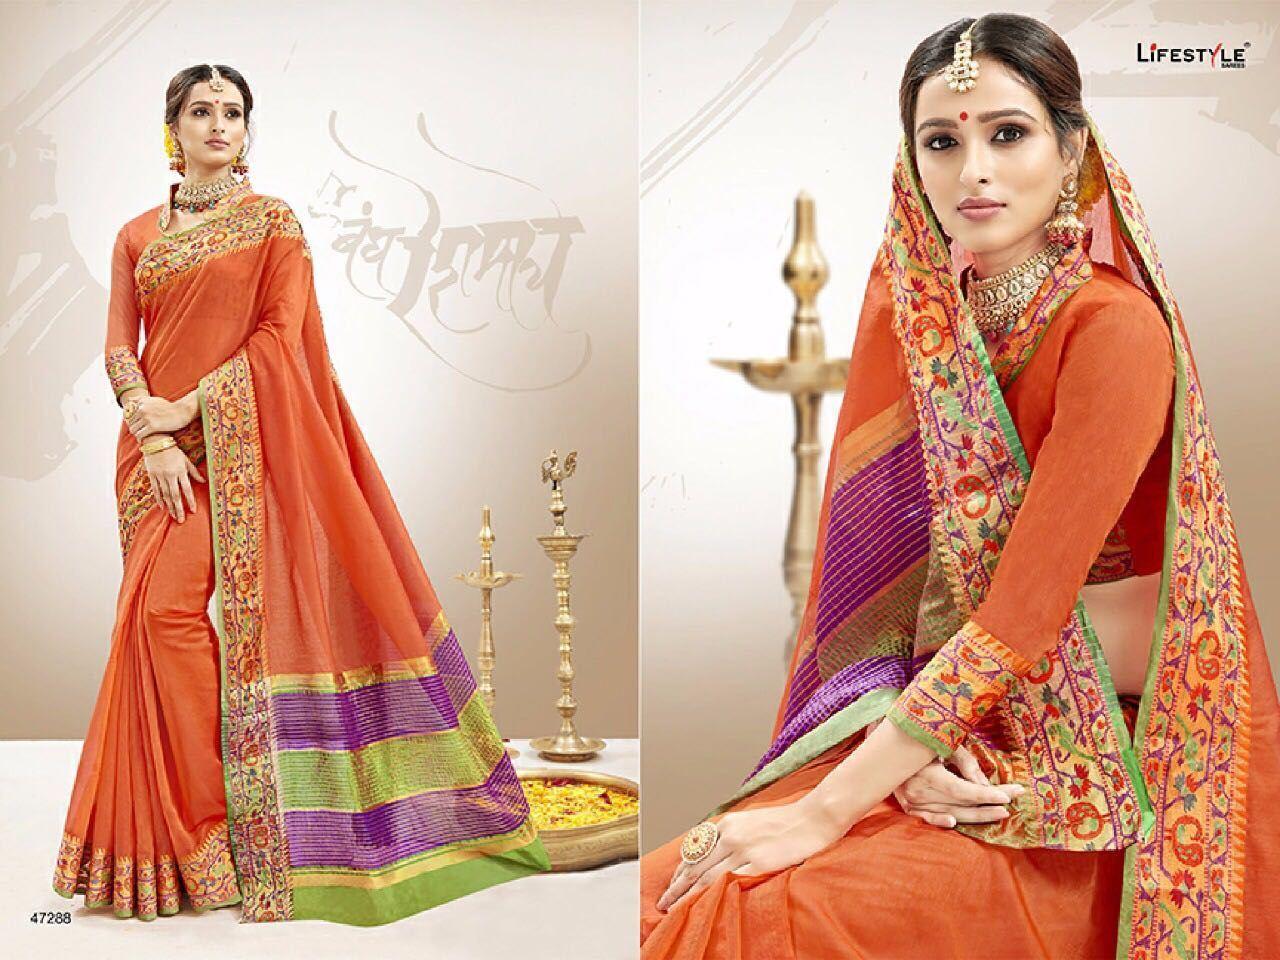 Lifestyle-Ranjhana-Design-No-47288